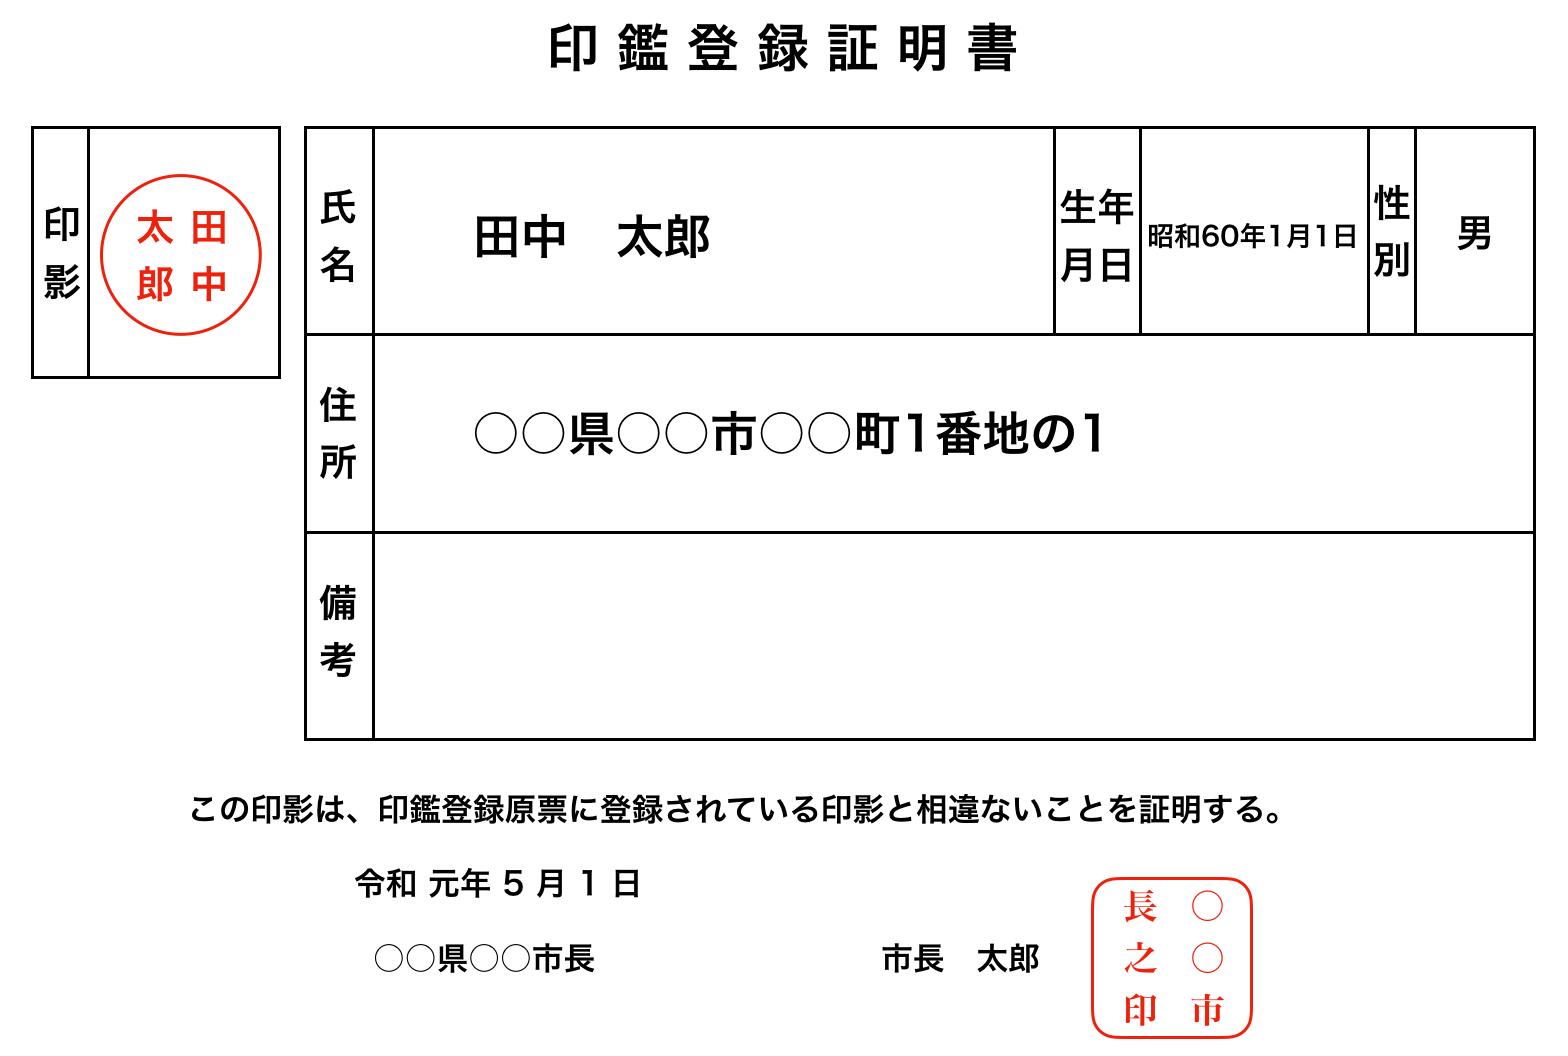 印鑑証明書の見本